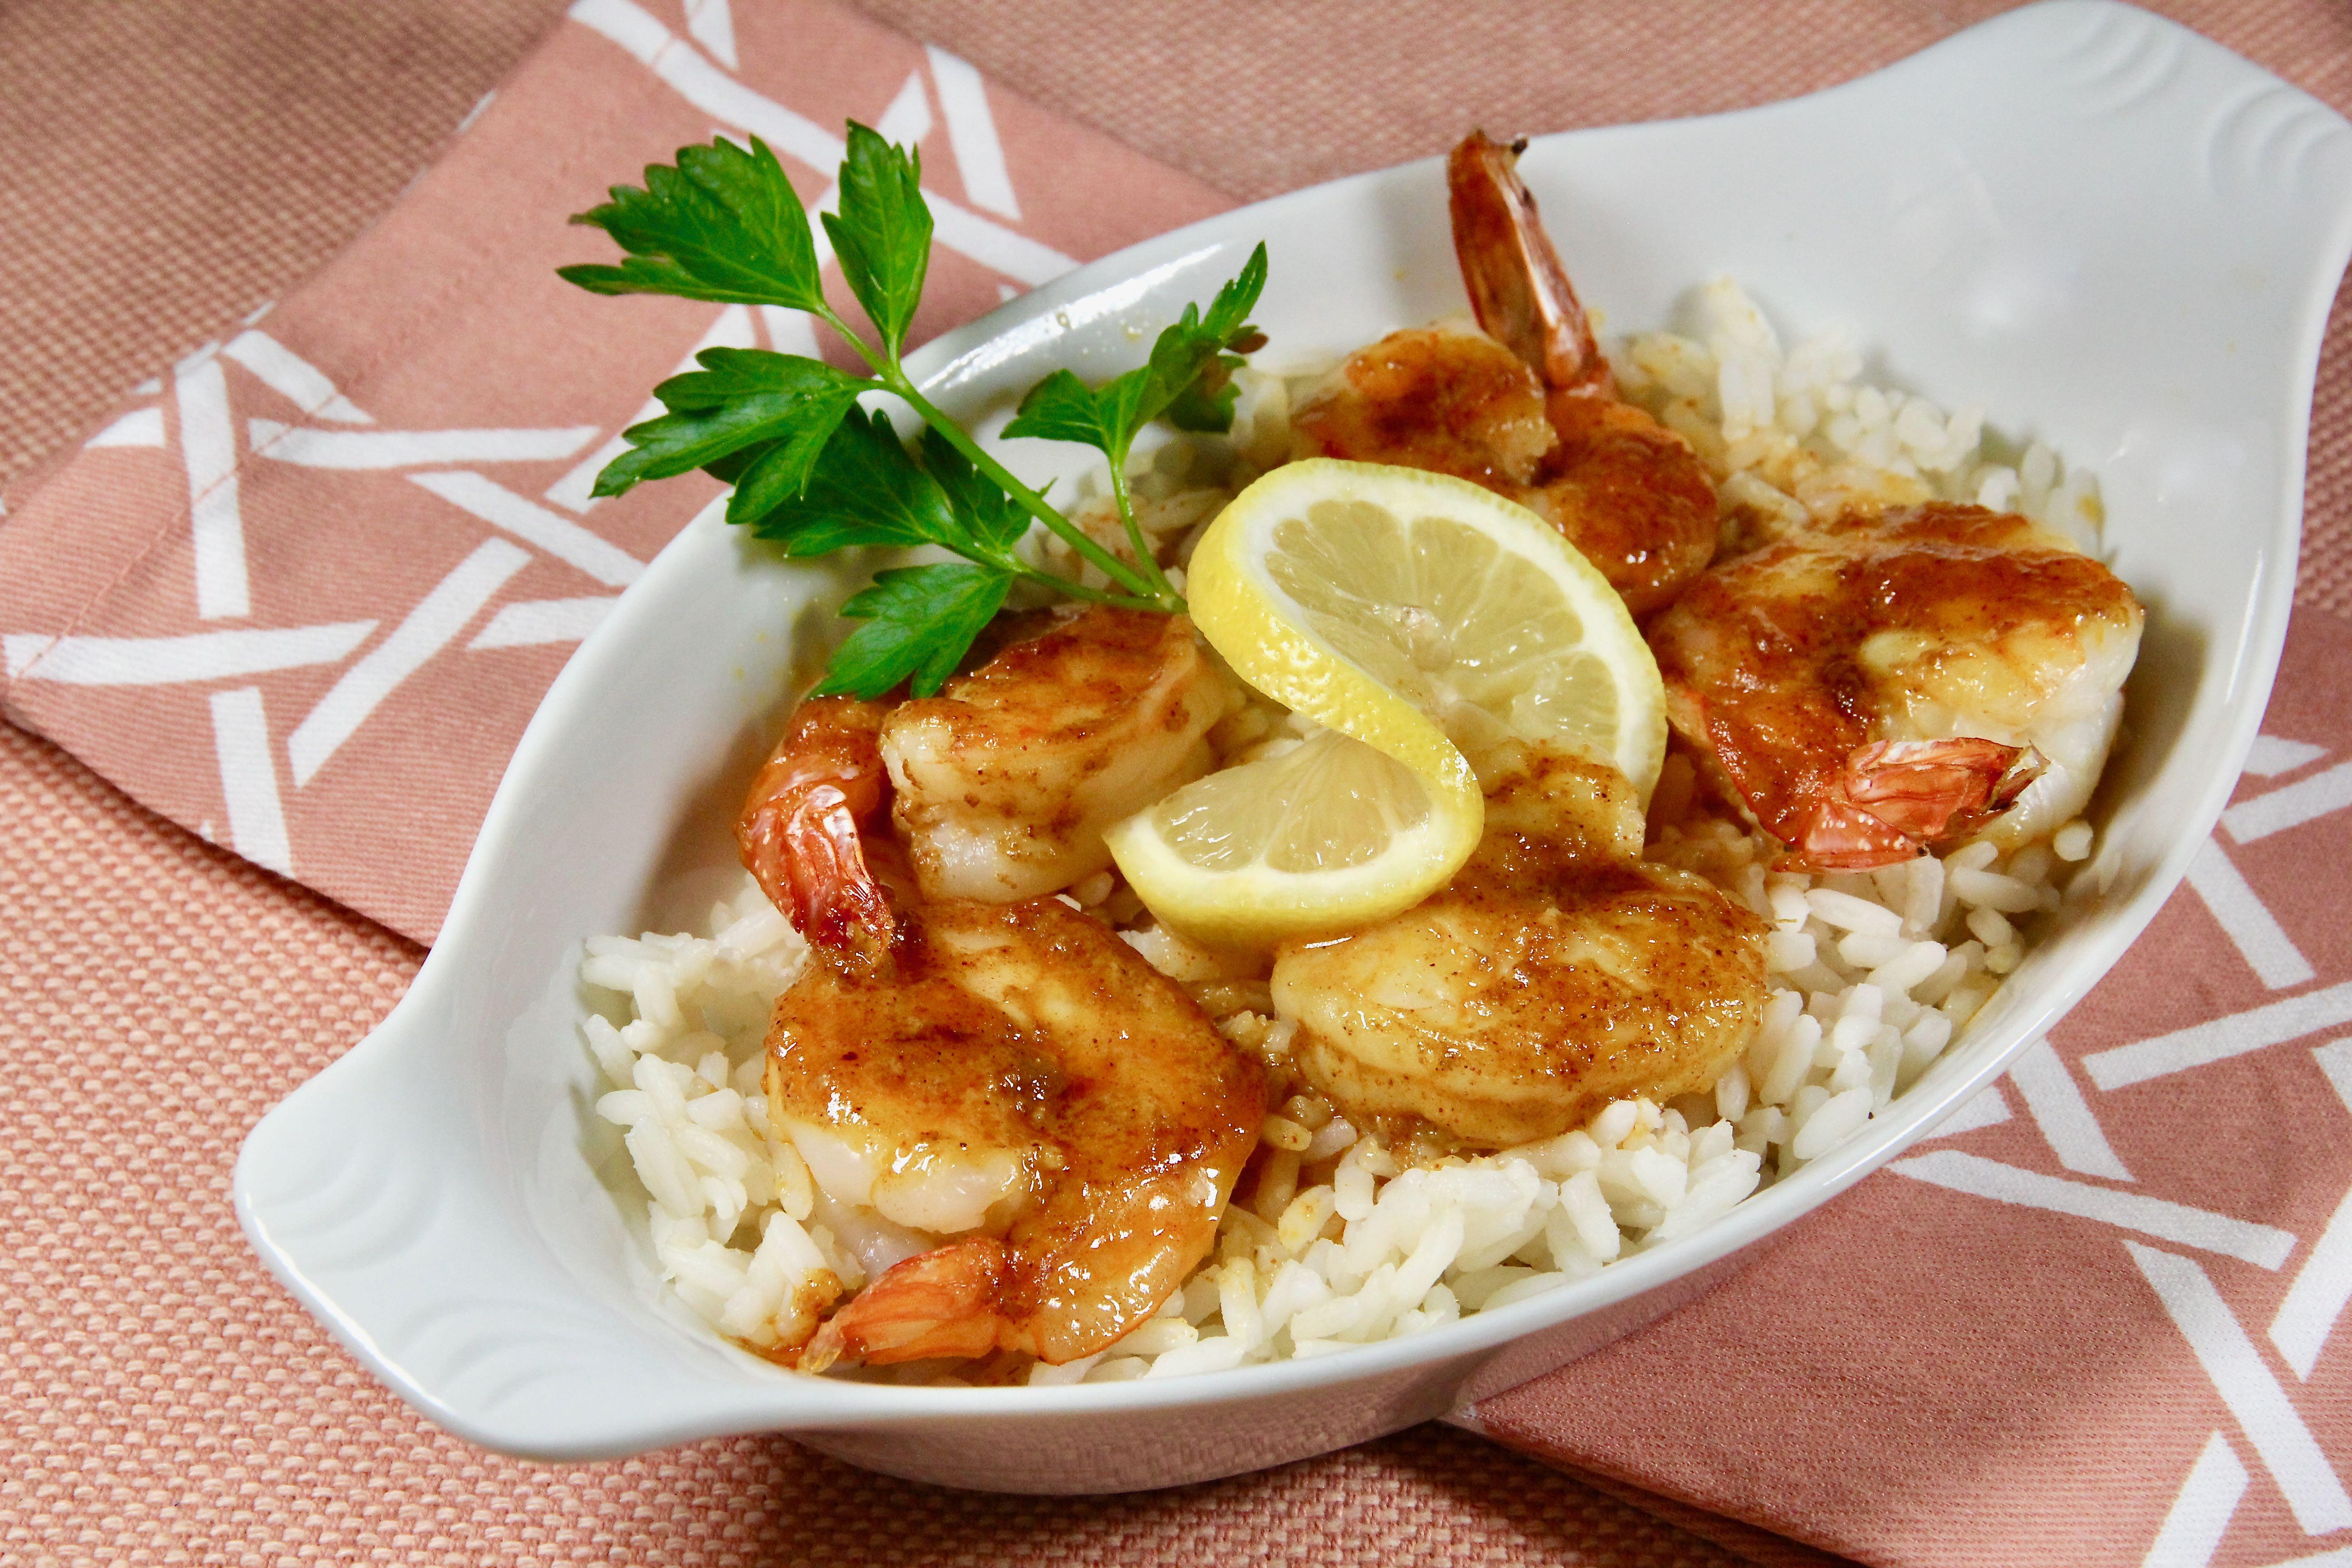 Curried Baked Shrimp